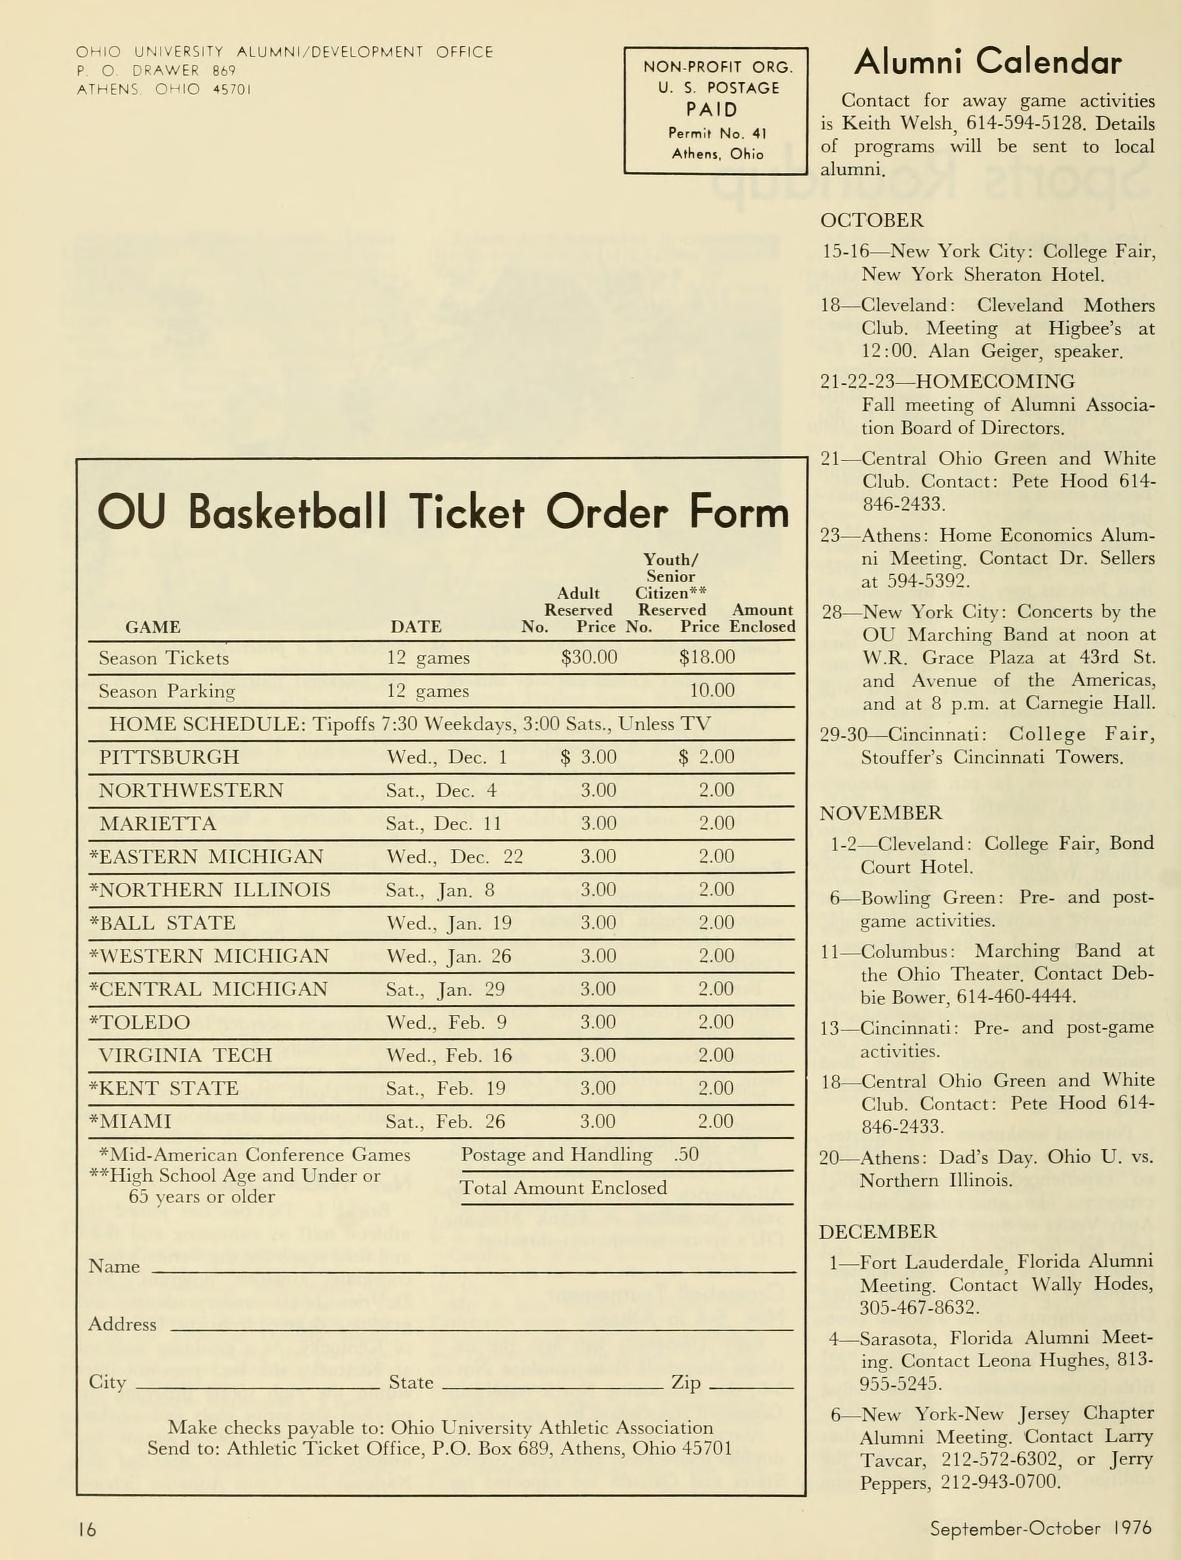 Ohio University Alumni Journal September October 1976 Ou Basketball Ticket Order Form Ohio University Archives Ohio University University Ohio